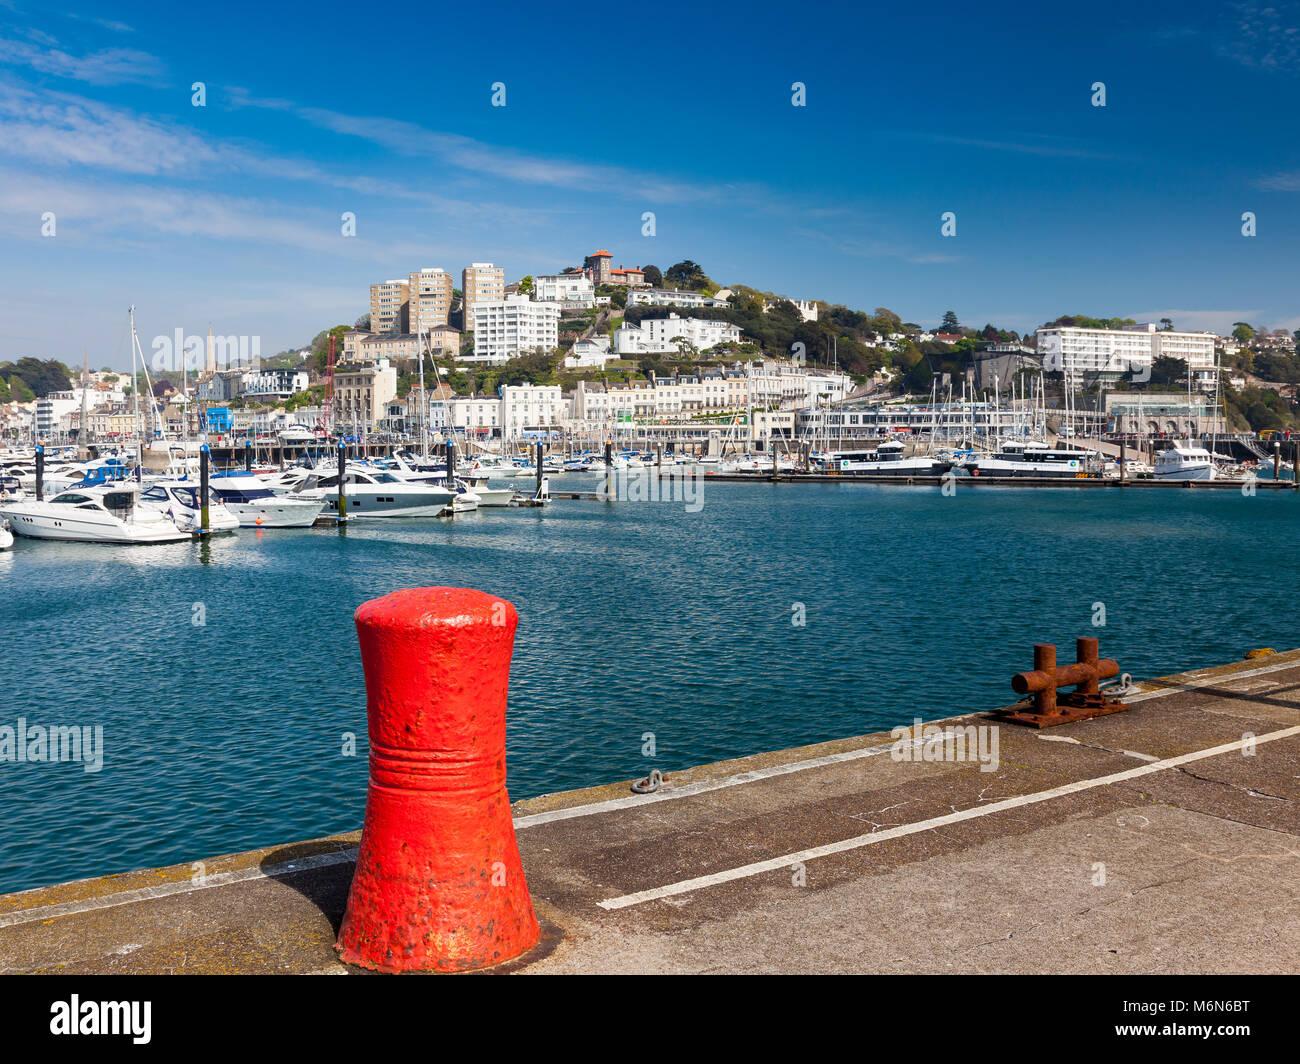 TORQUAY, REINO UNIDO - 7 de mayo de 2016 - Verano en Torquay Harbour & Marina Devon, Inglaterra un destino turístico Imagen De Stock